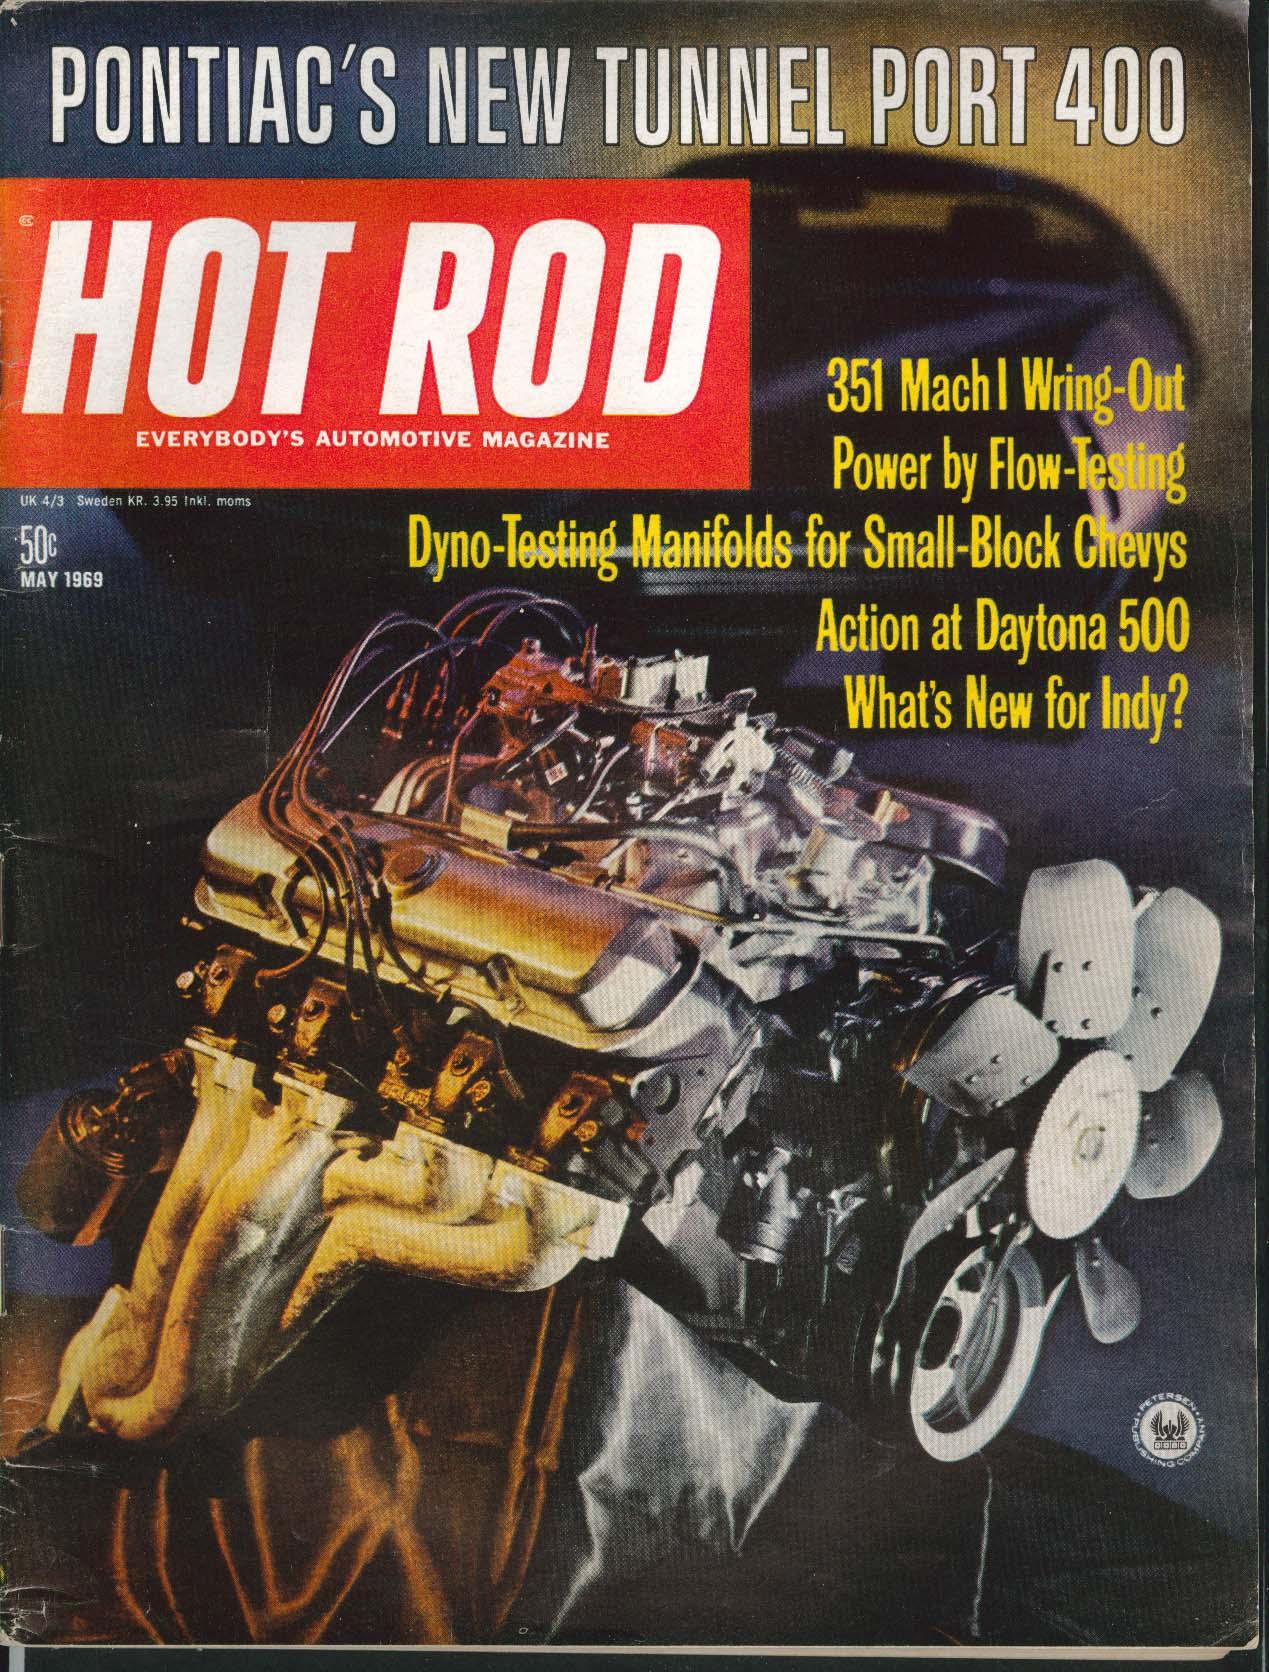 HOT ROD Pontiac Tunnel Port 400 351 Mach I Daytona 500 5 1969